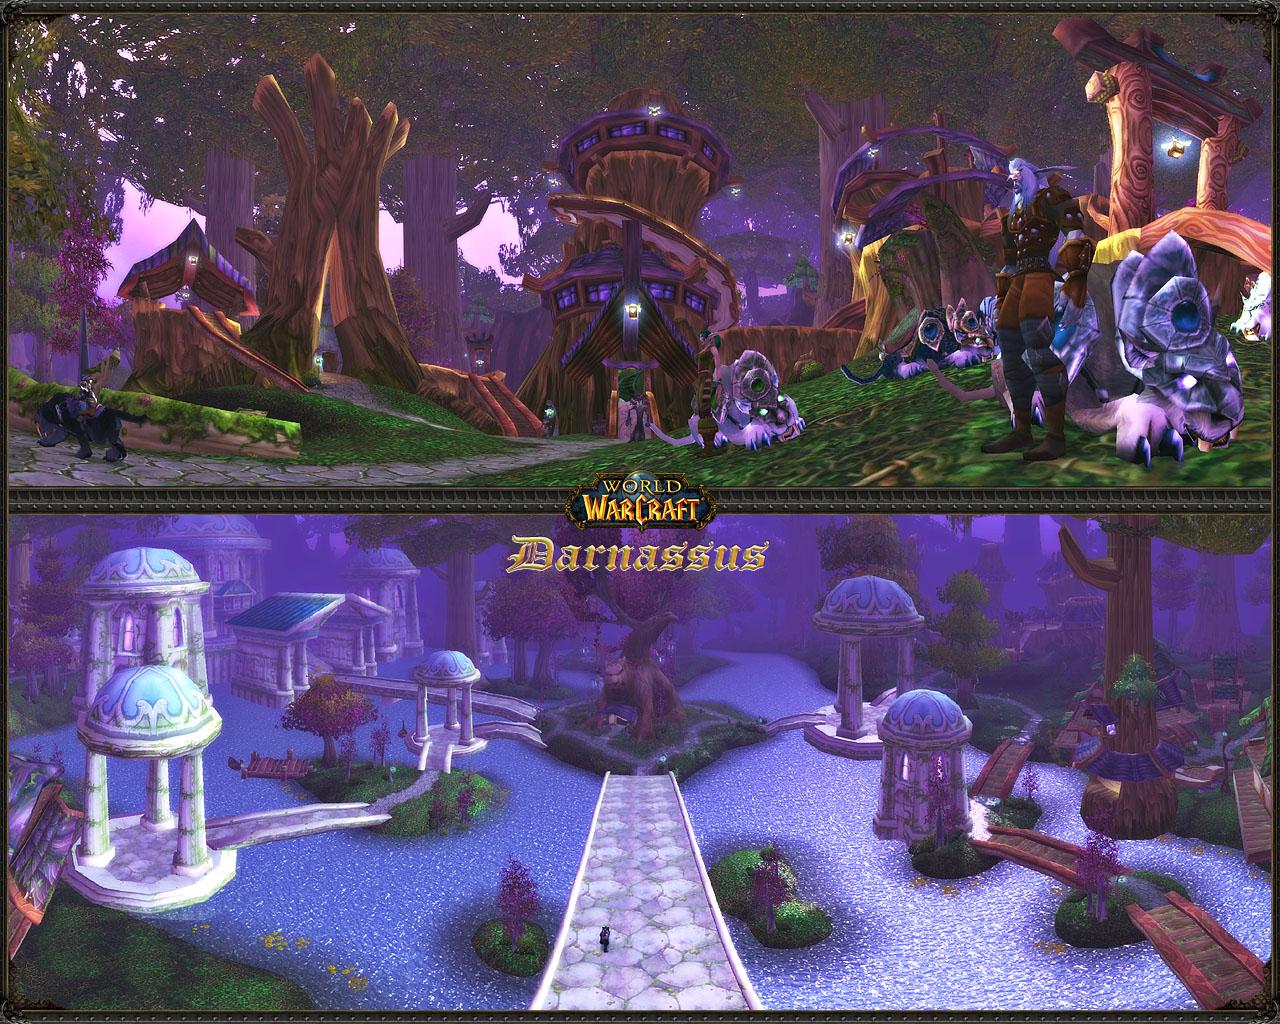 Wwwnebdaarcom World Of Warcraft Panoramic Wallpapers